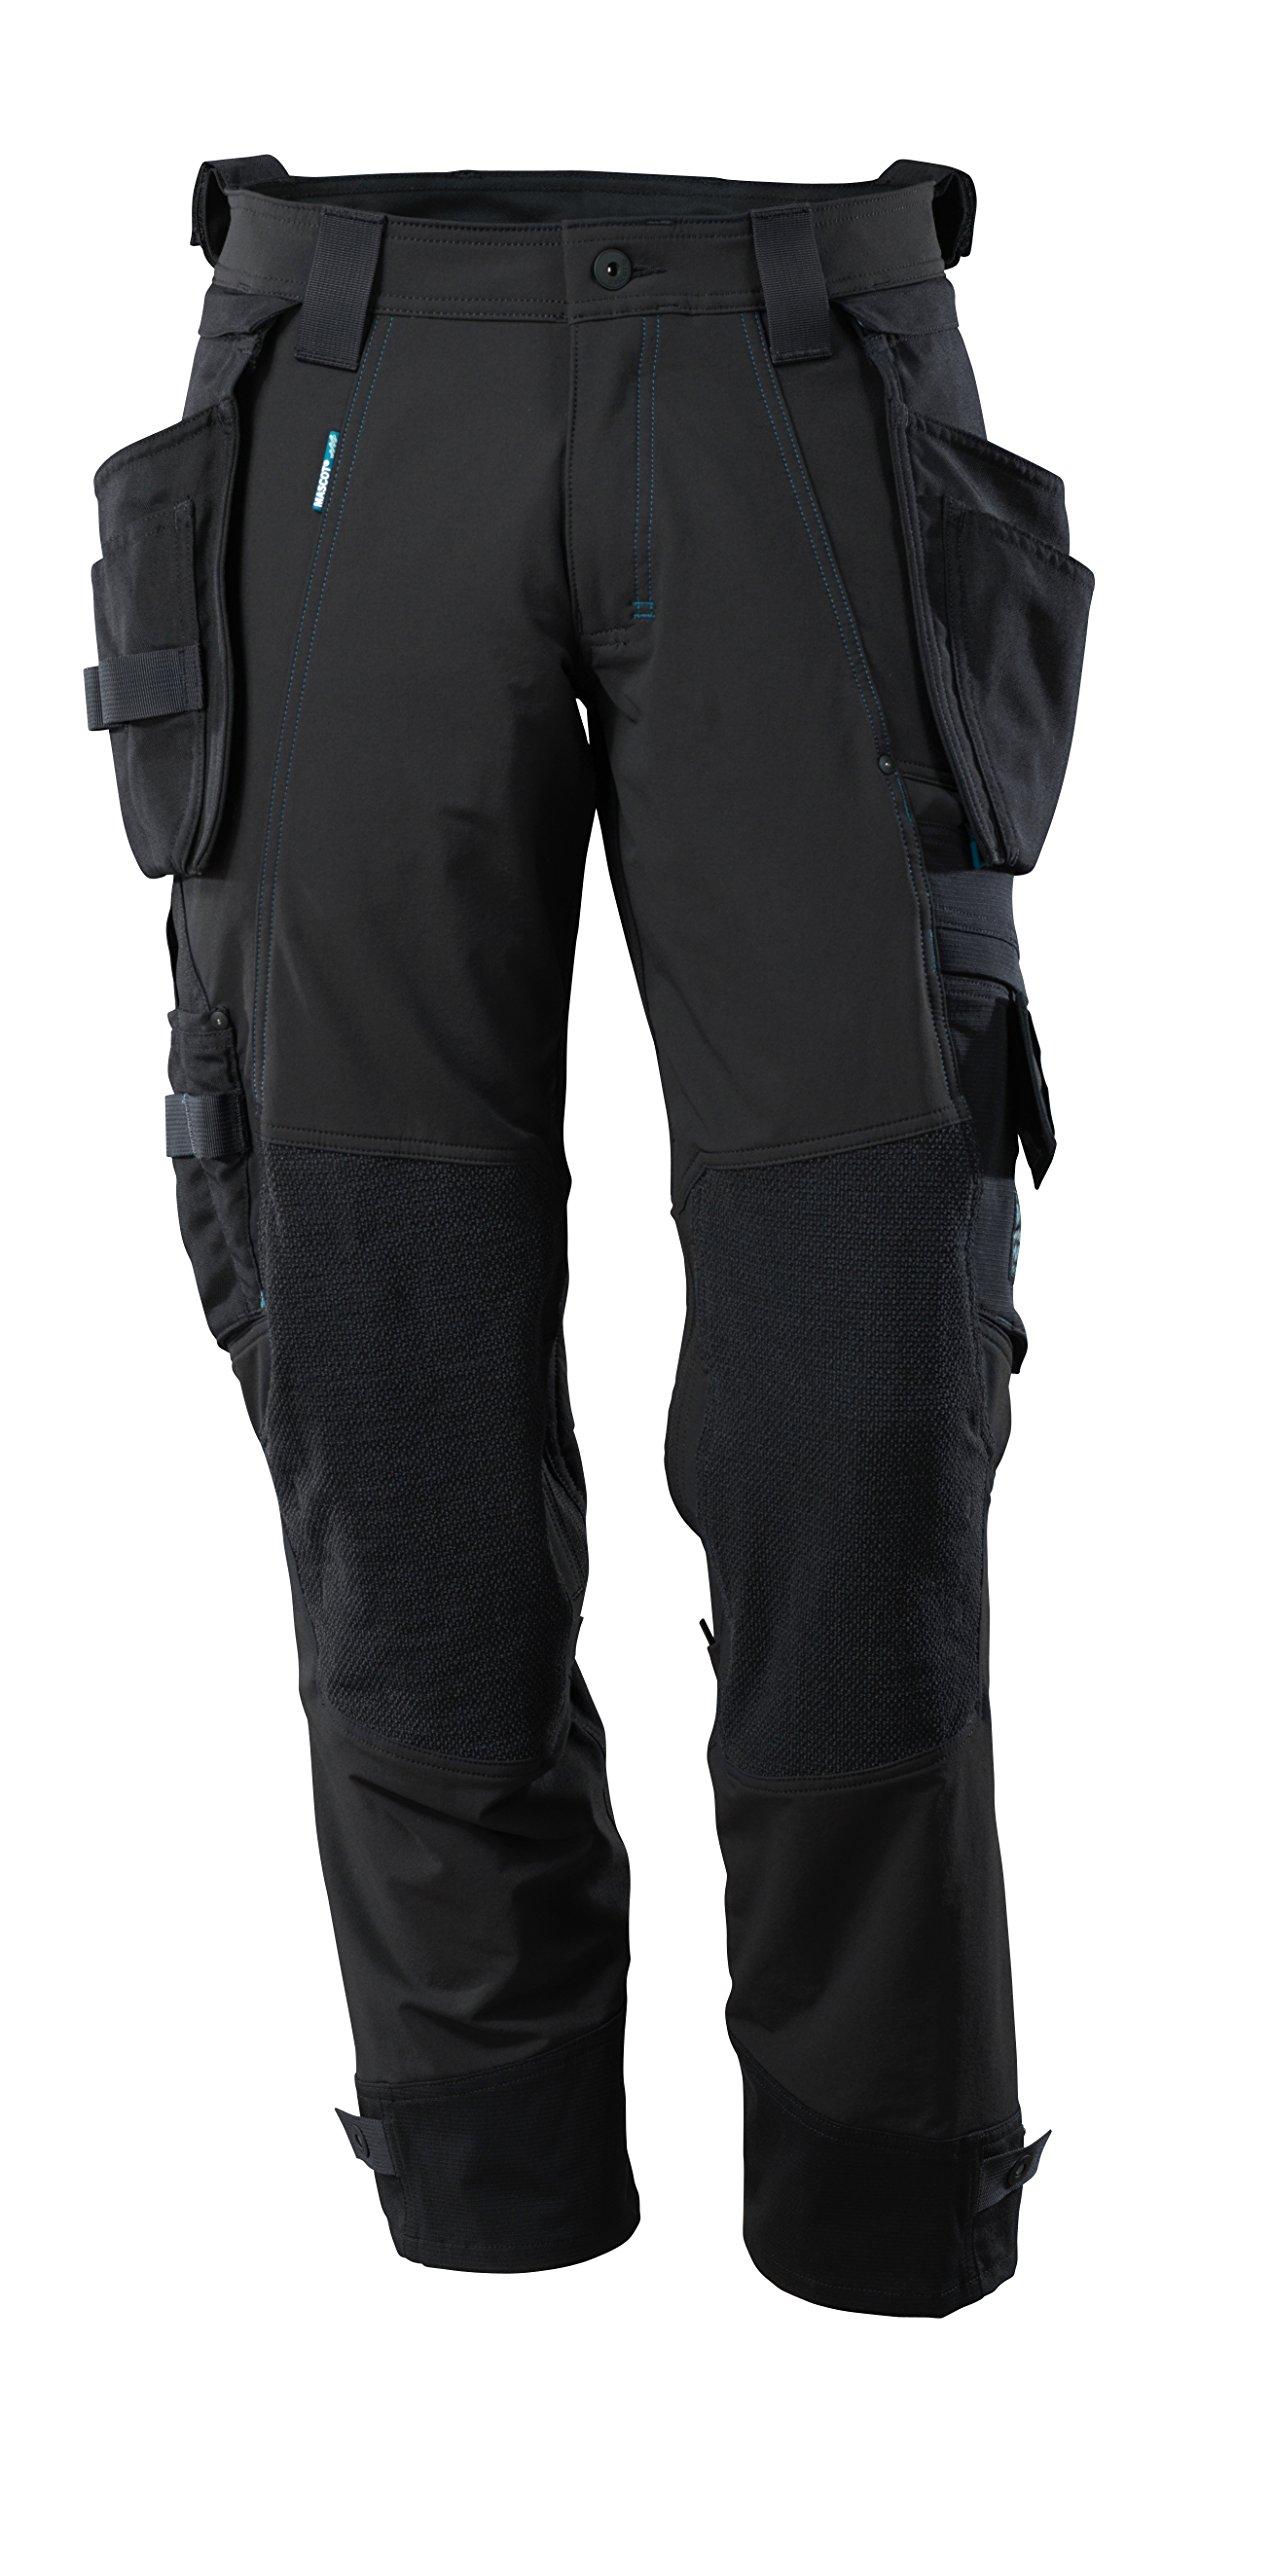 Mascot 17031-311-09-82C42 Trousers Safety Pants, Black, 82C42